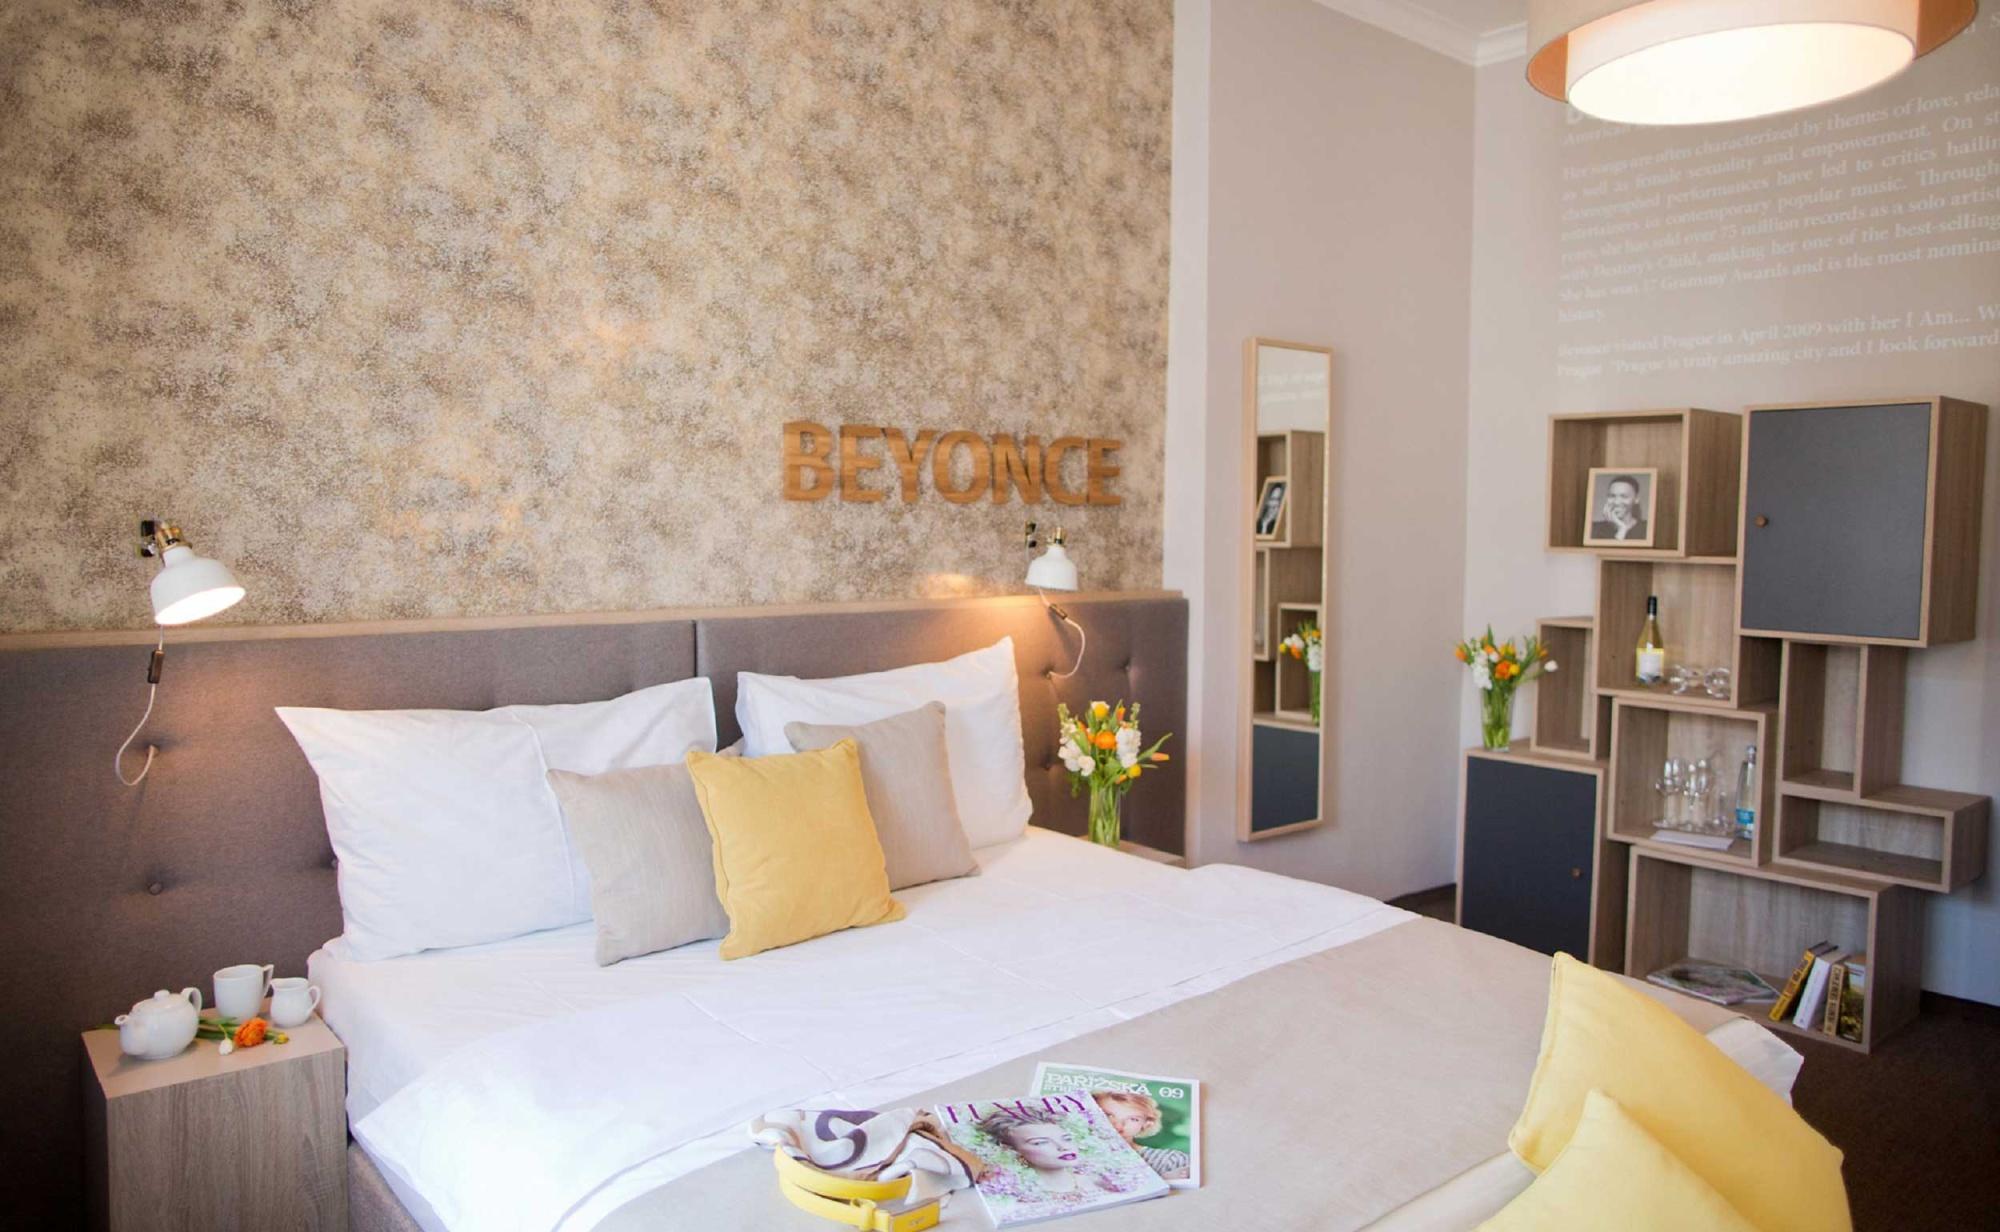 Boutique hotel klarov prague for Boutique accommodation prague